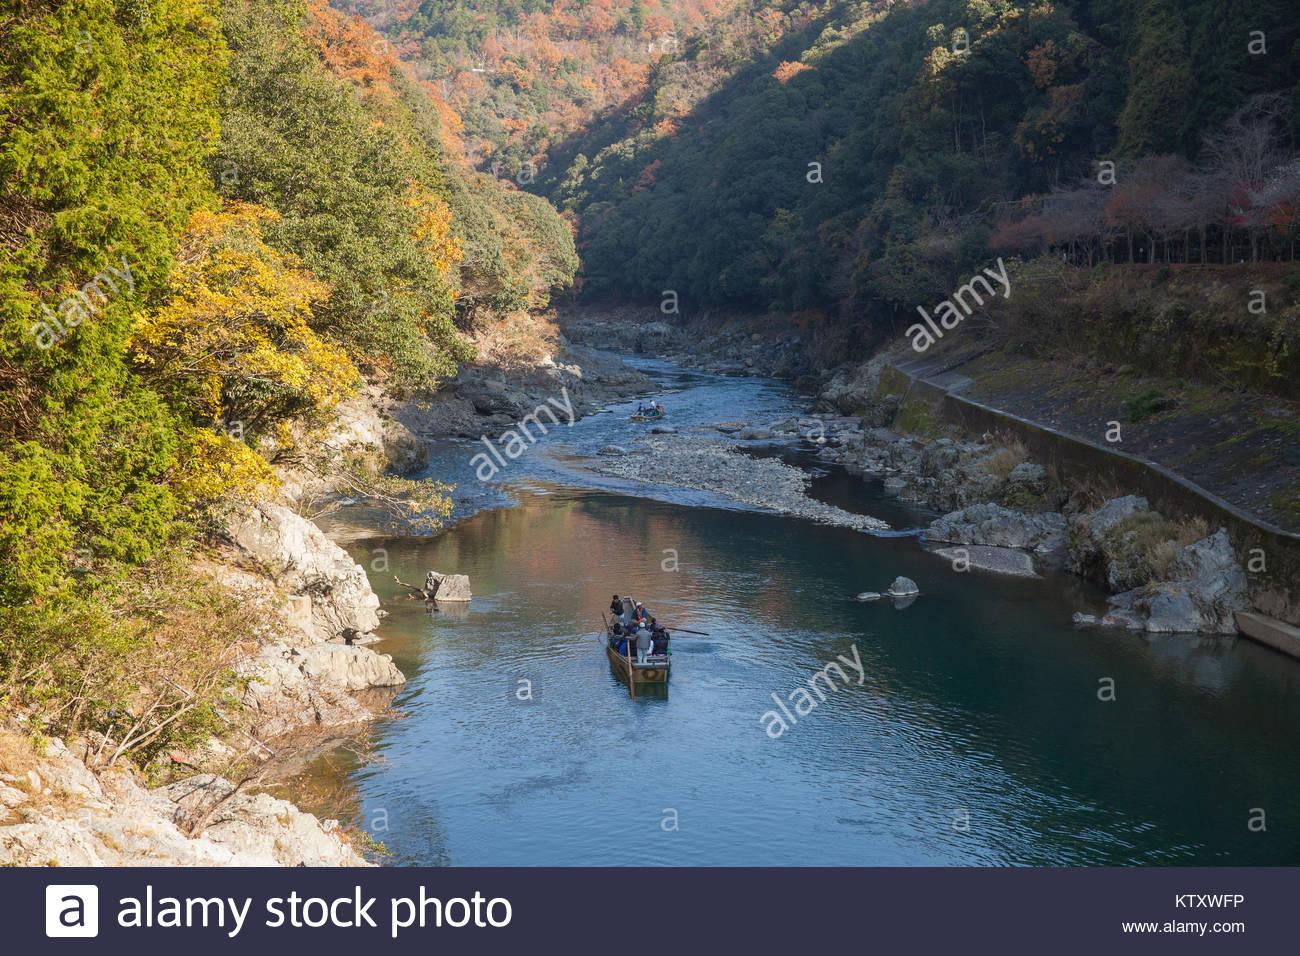 Kyoto, JAPAN - NOVEMBER 28, 2017: Top view traveler on the boat in Hozu-gawa river from Torokko Hodukyo station - Stock Image